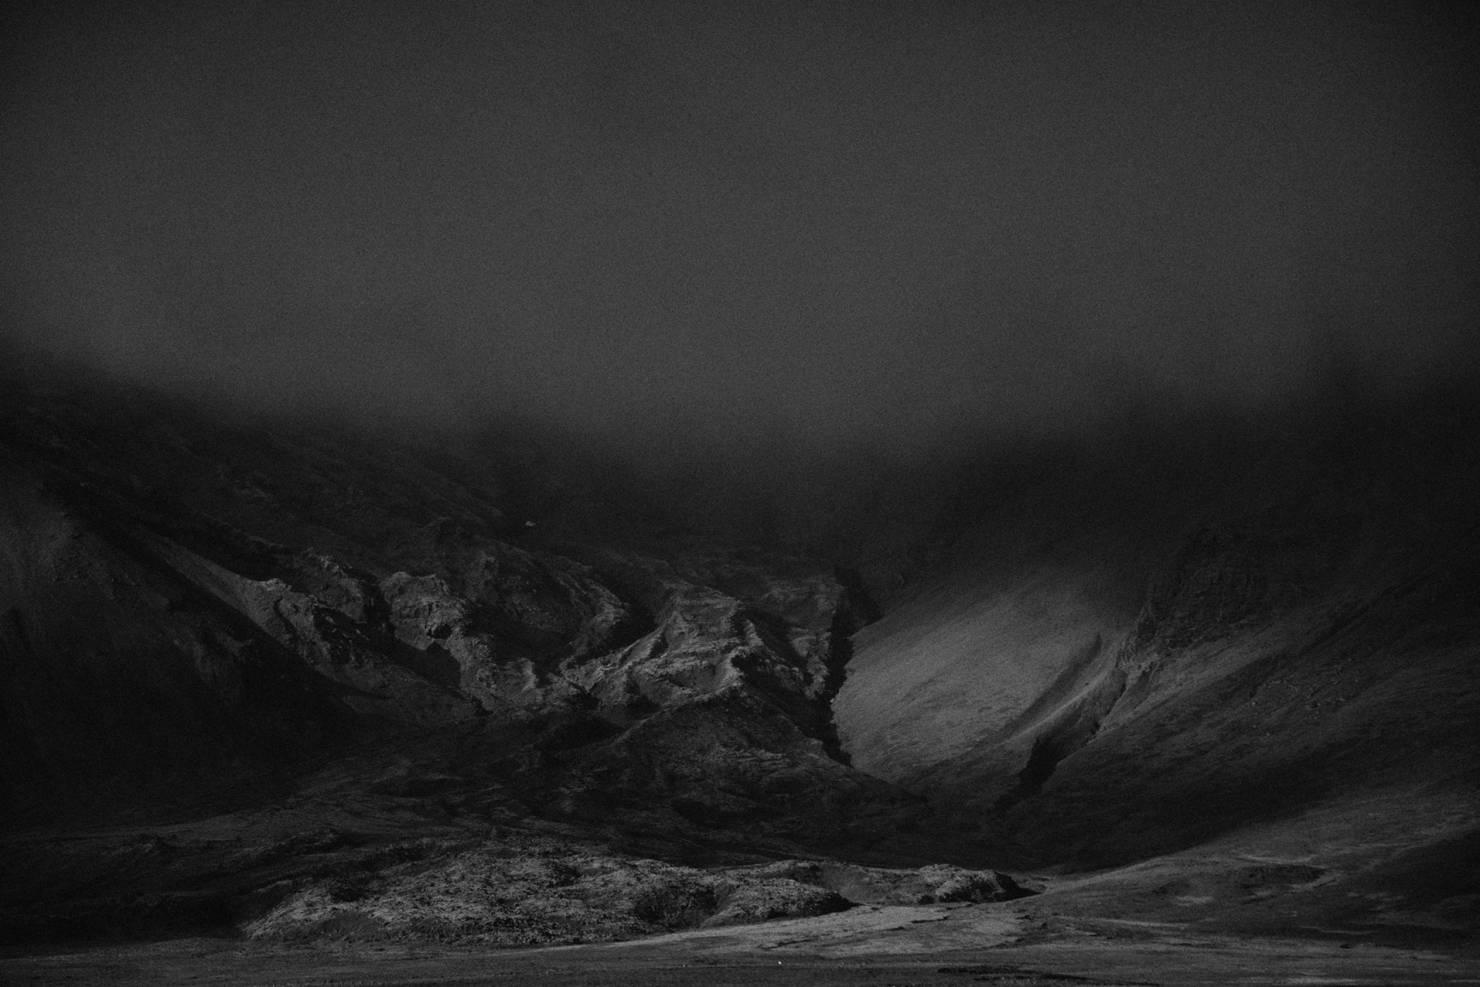 patrick_schuttler_landscape_iceland_006-43394c50a7391b0747fc682ba85ff661